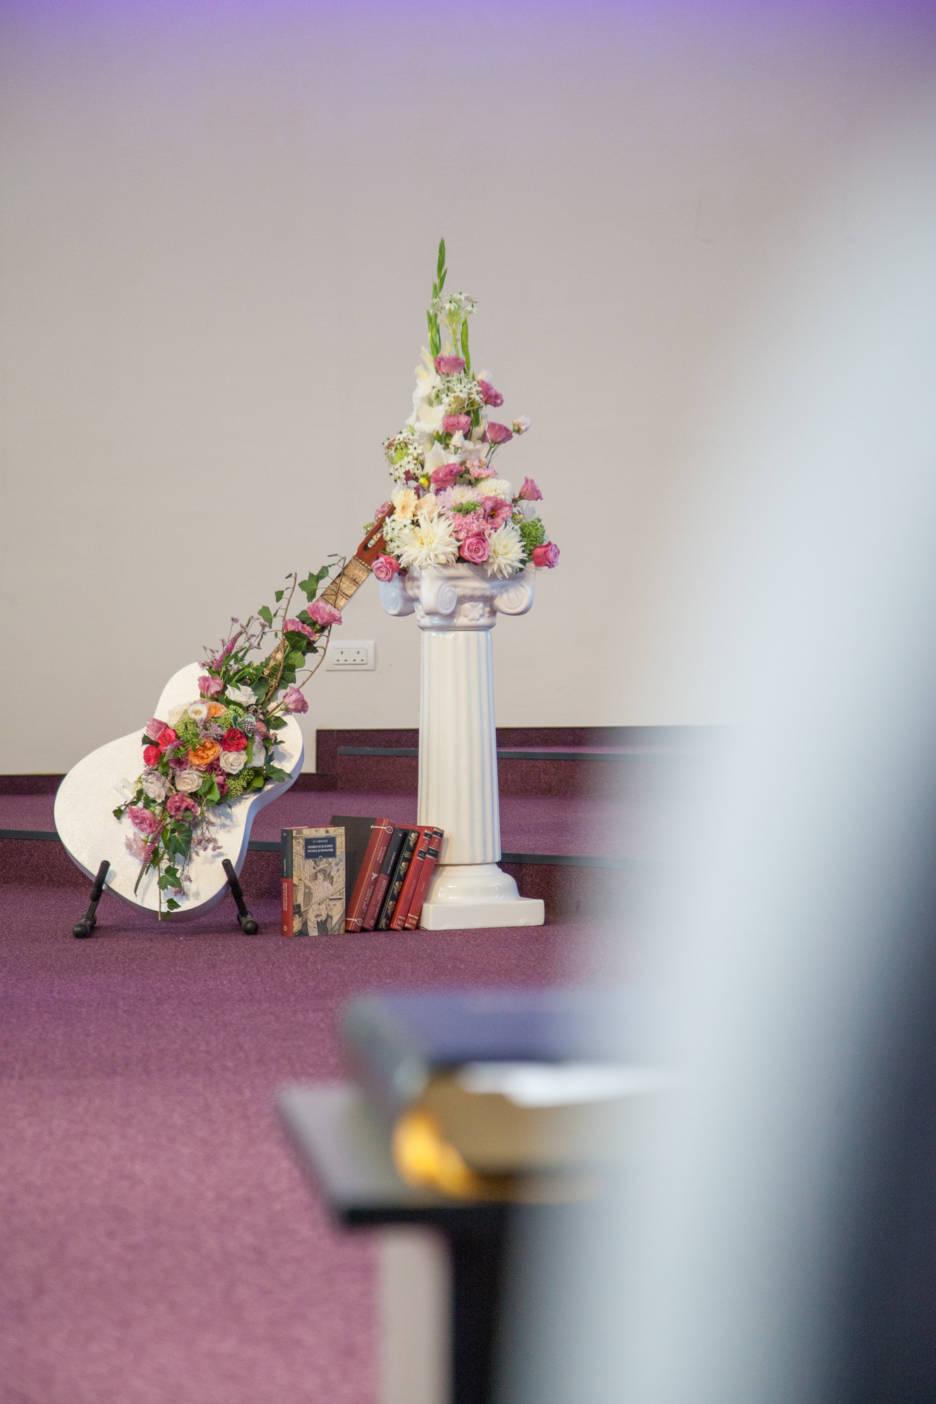 Poza, foto cu Flori de nunta decor biserica in Arad, Timisoara, Oradea (wedding flowers, bouquets) nunta Arad